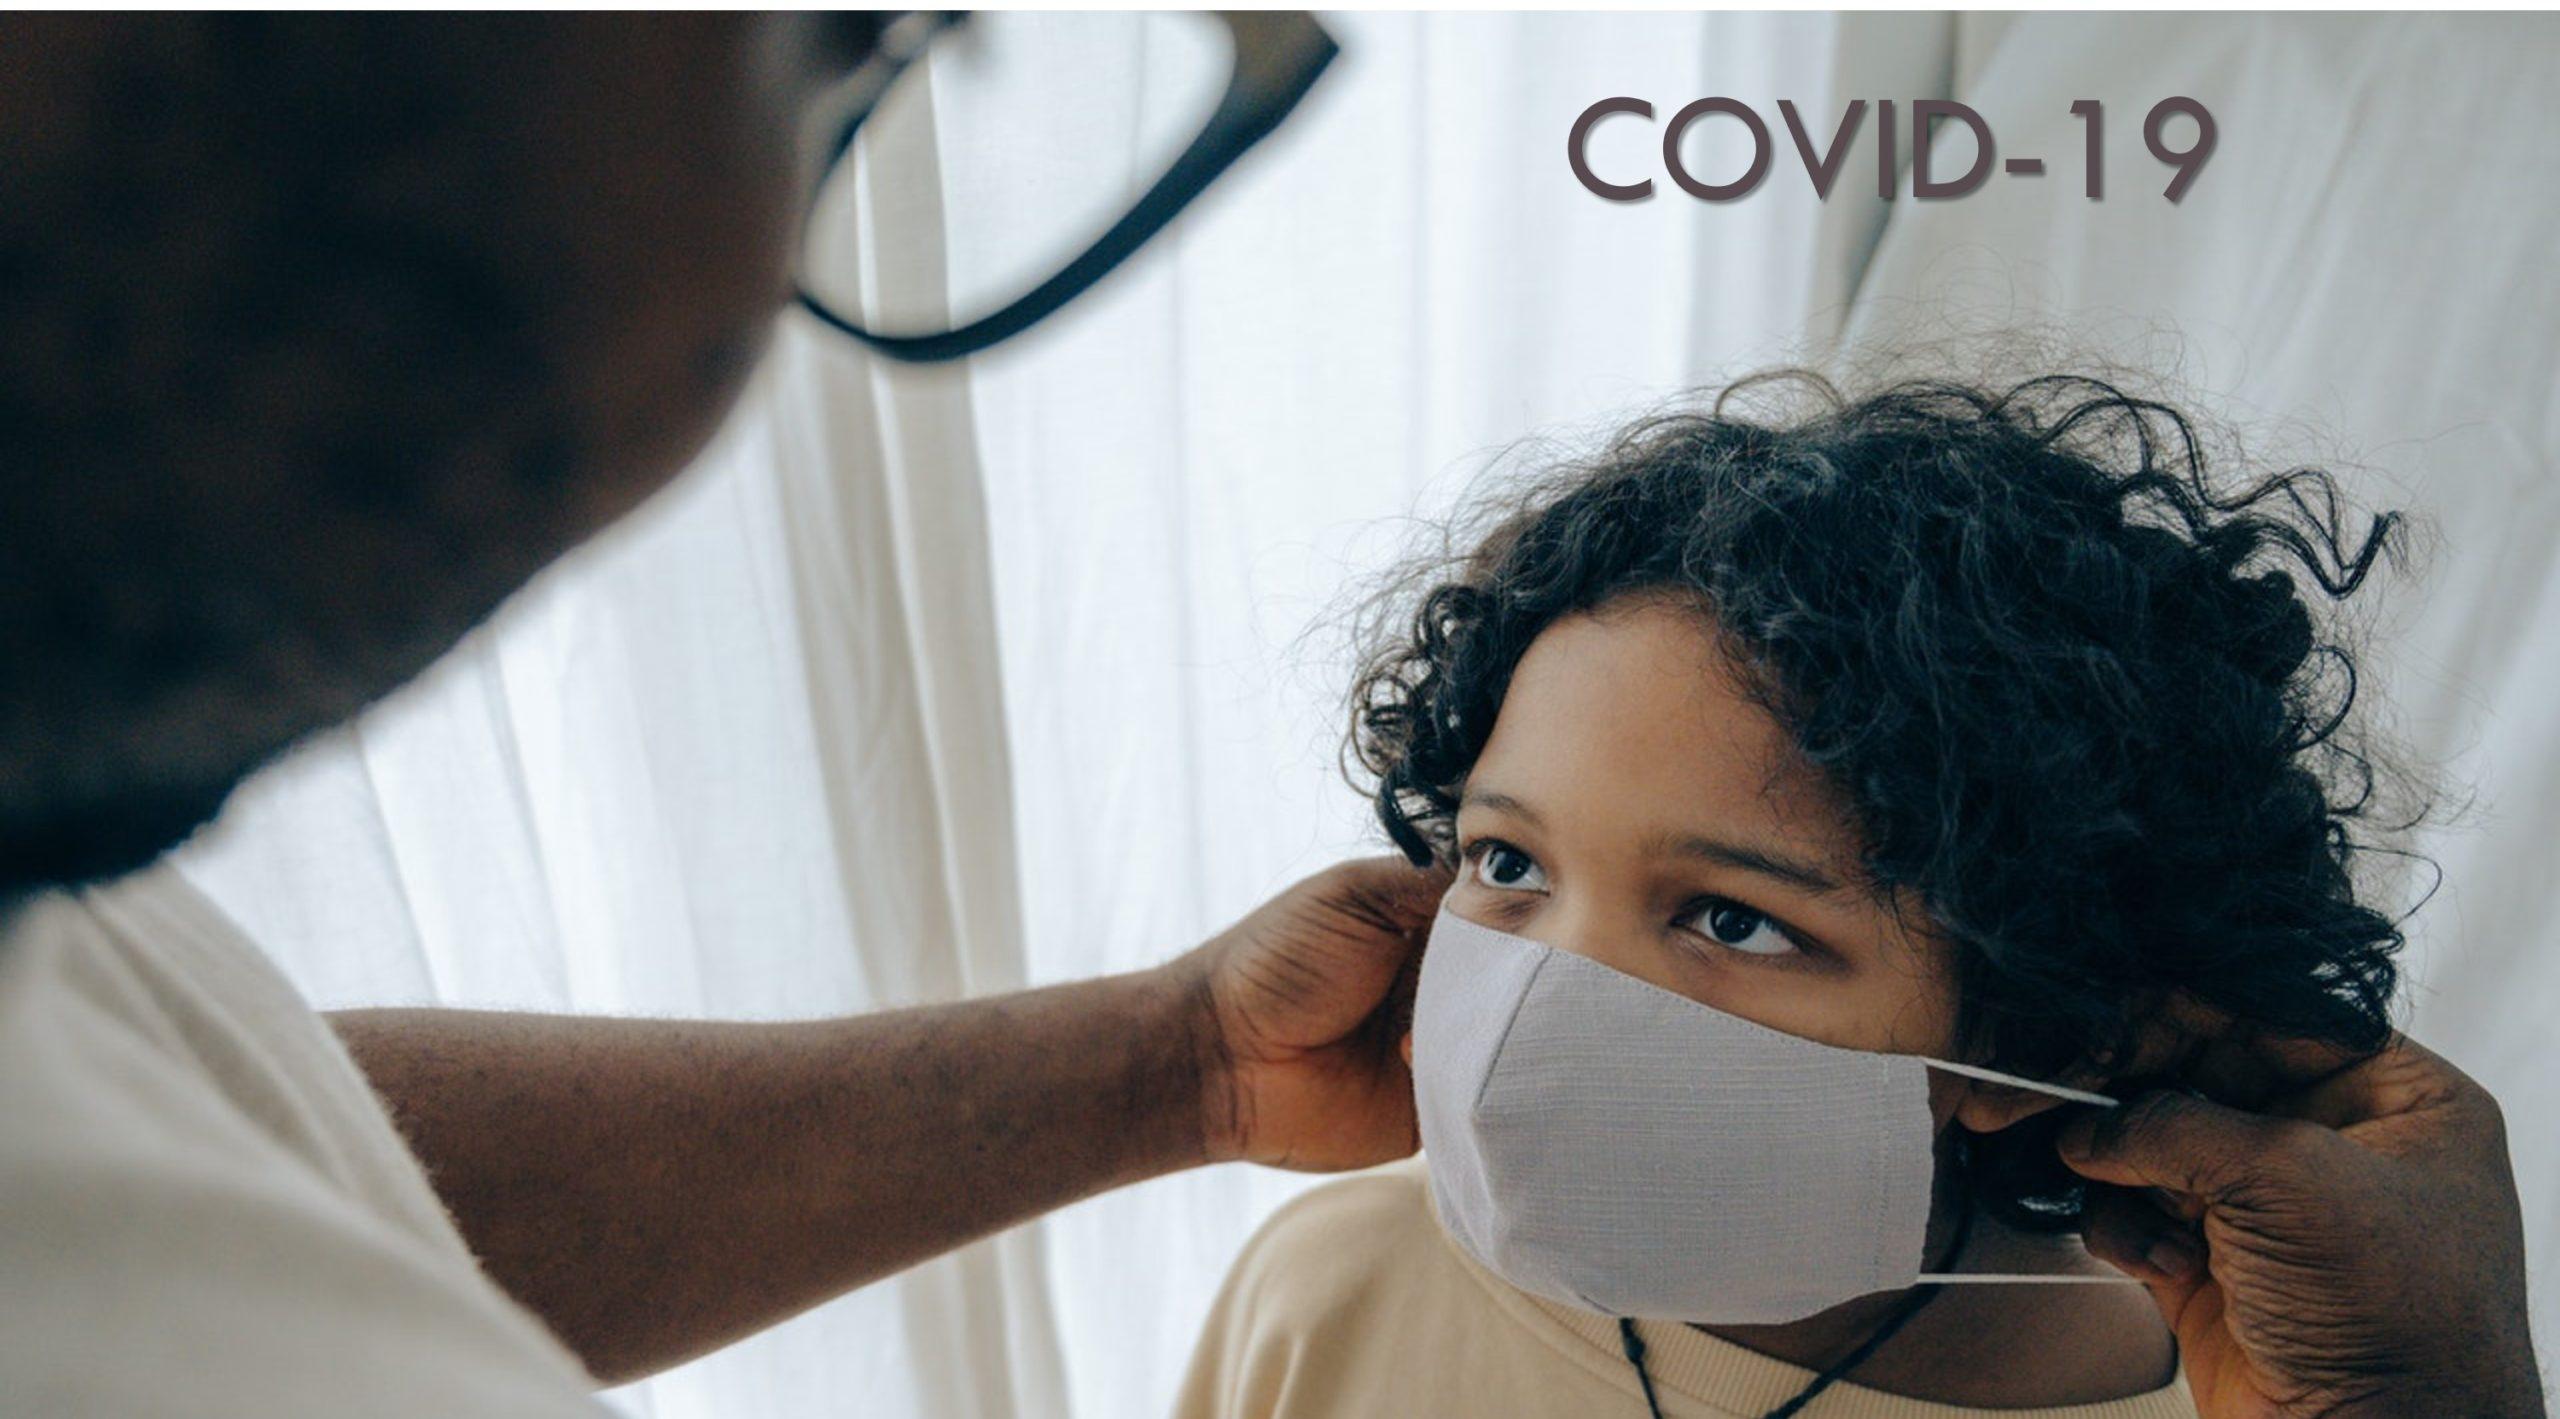 COVID-19 Awareness at Dr. Roshni Naicker's Practice